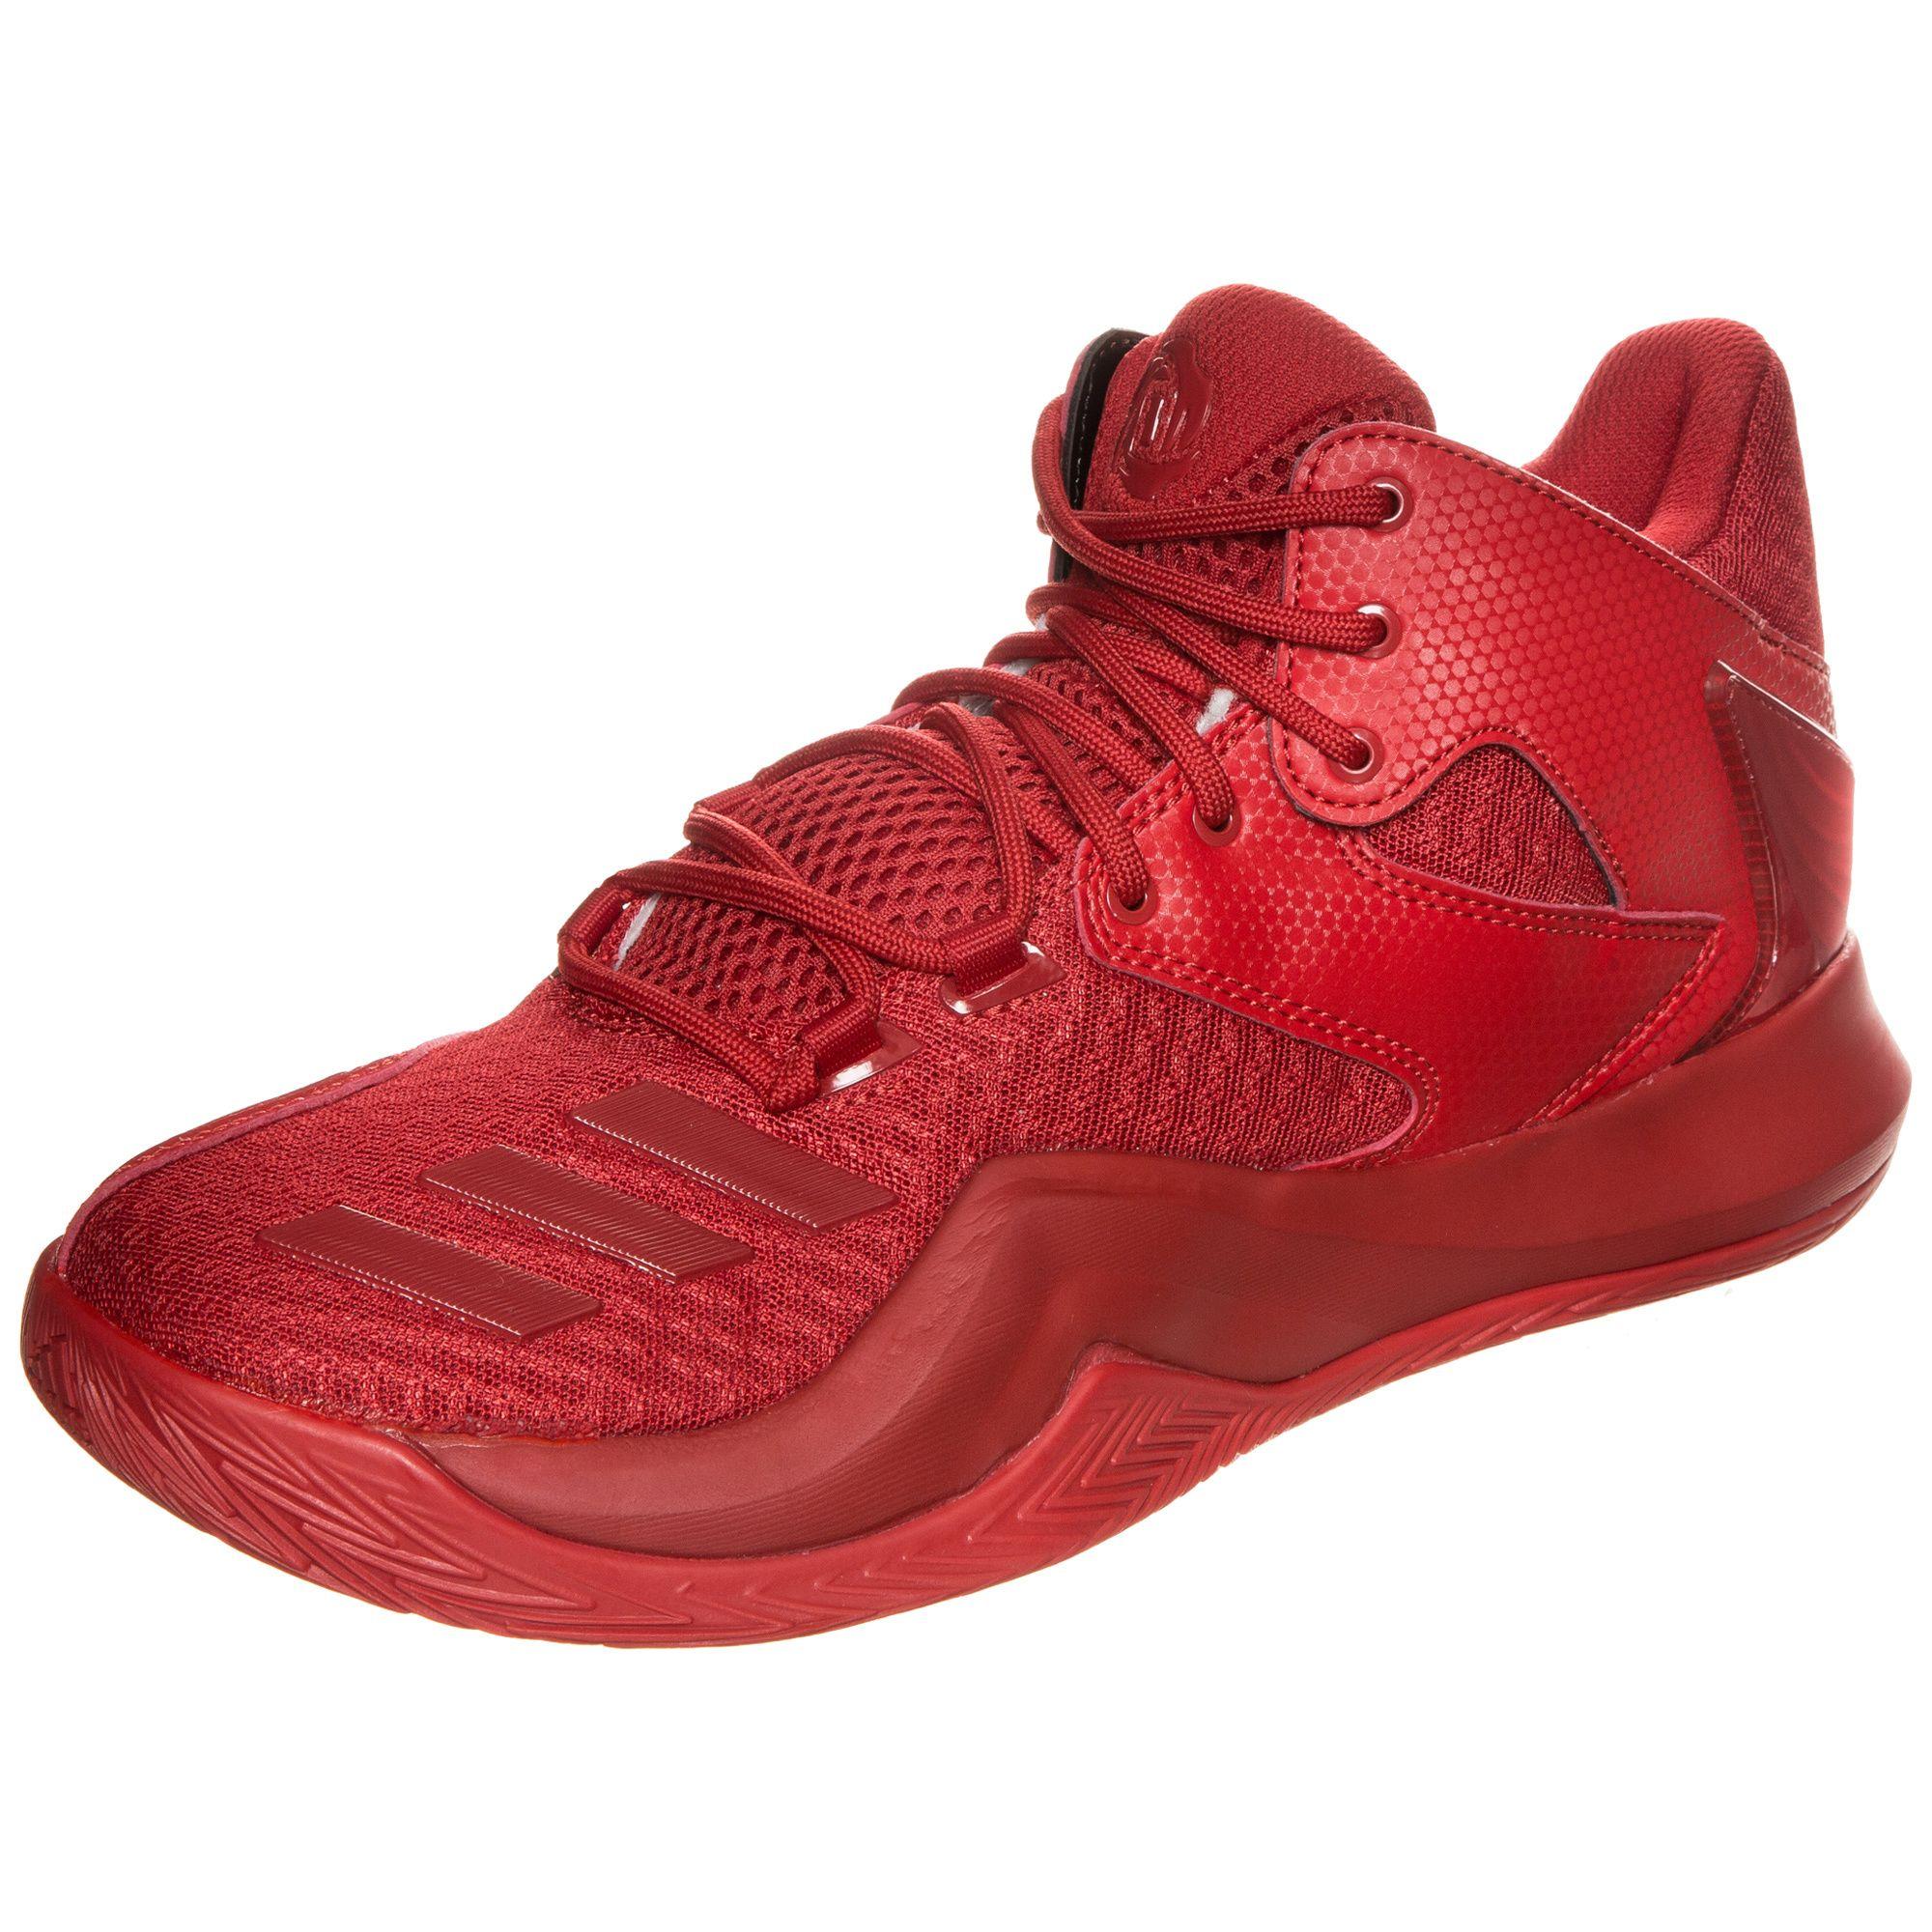 ADIDAS PERFORMANCE adidas Performance Derrick Rose 773 V Basketballschuh Herren